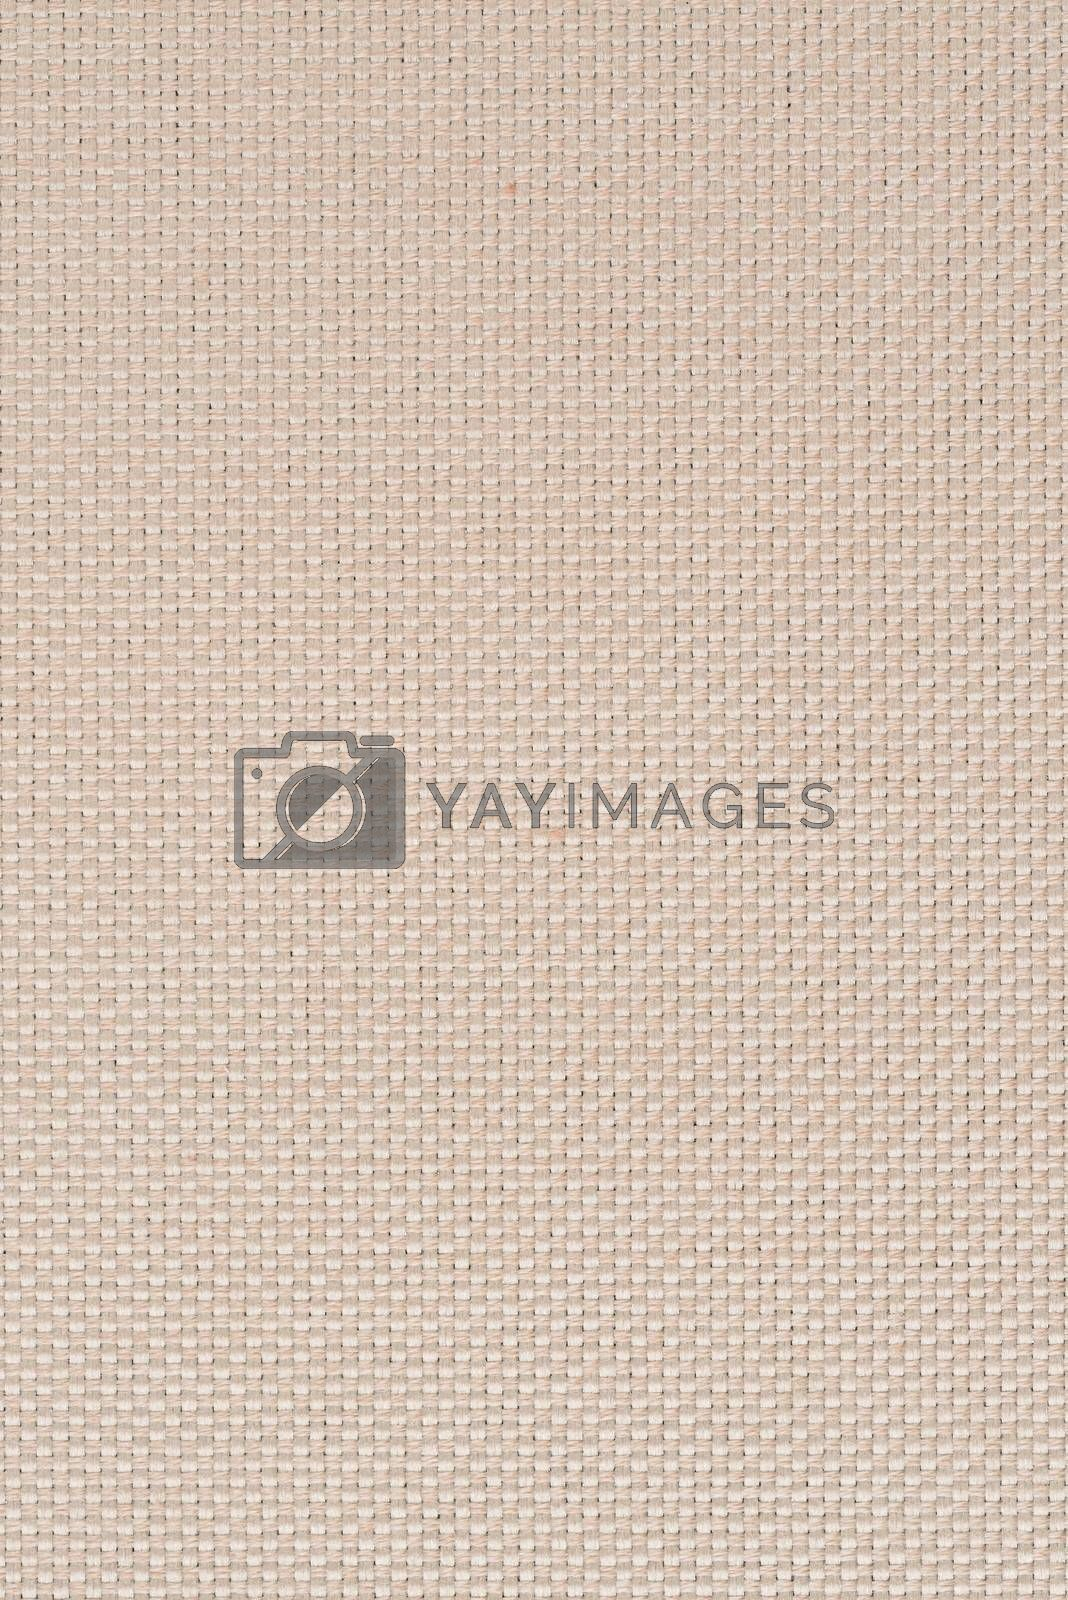 Royalty free image of Beige vinyl texture by homydesign